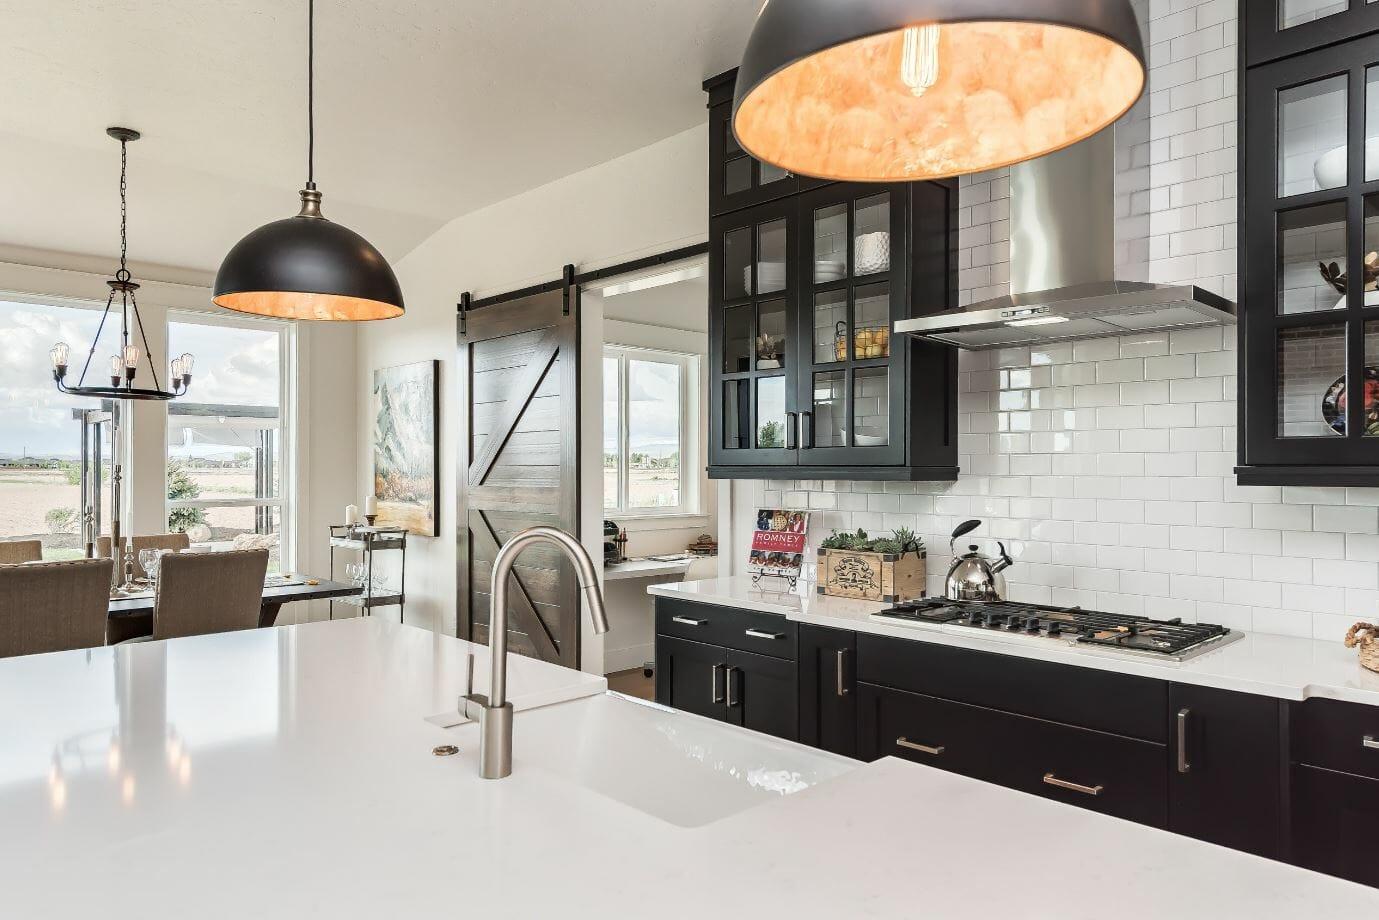 Modern Farmhouse Interior Design: 7 Best Tips To Create